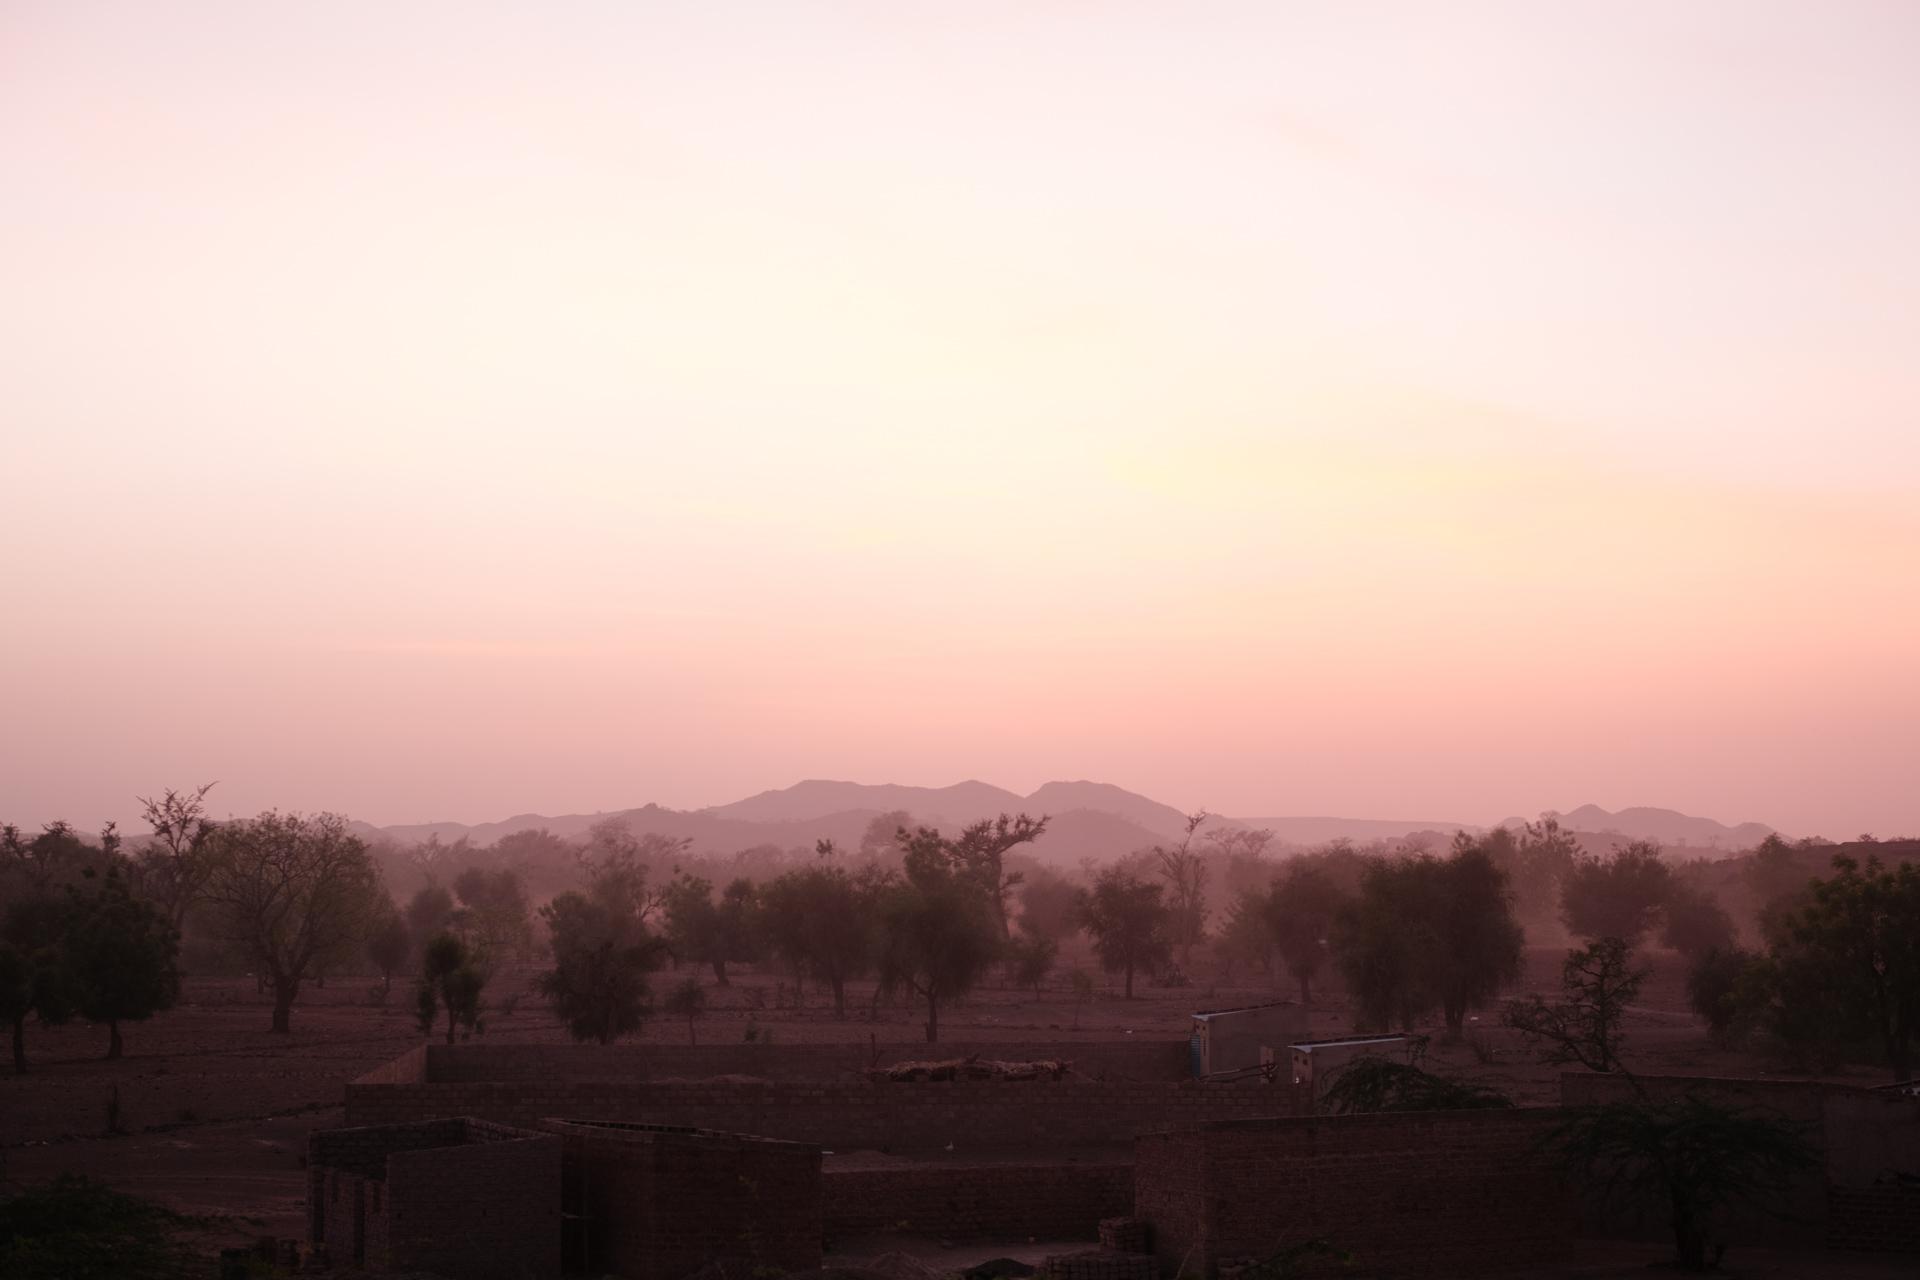 Burkina-Faso-Trees-Reforestation-Ecosia--13-of-38-